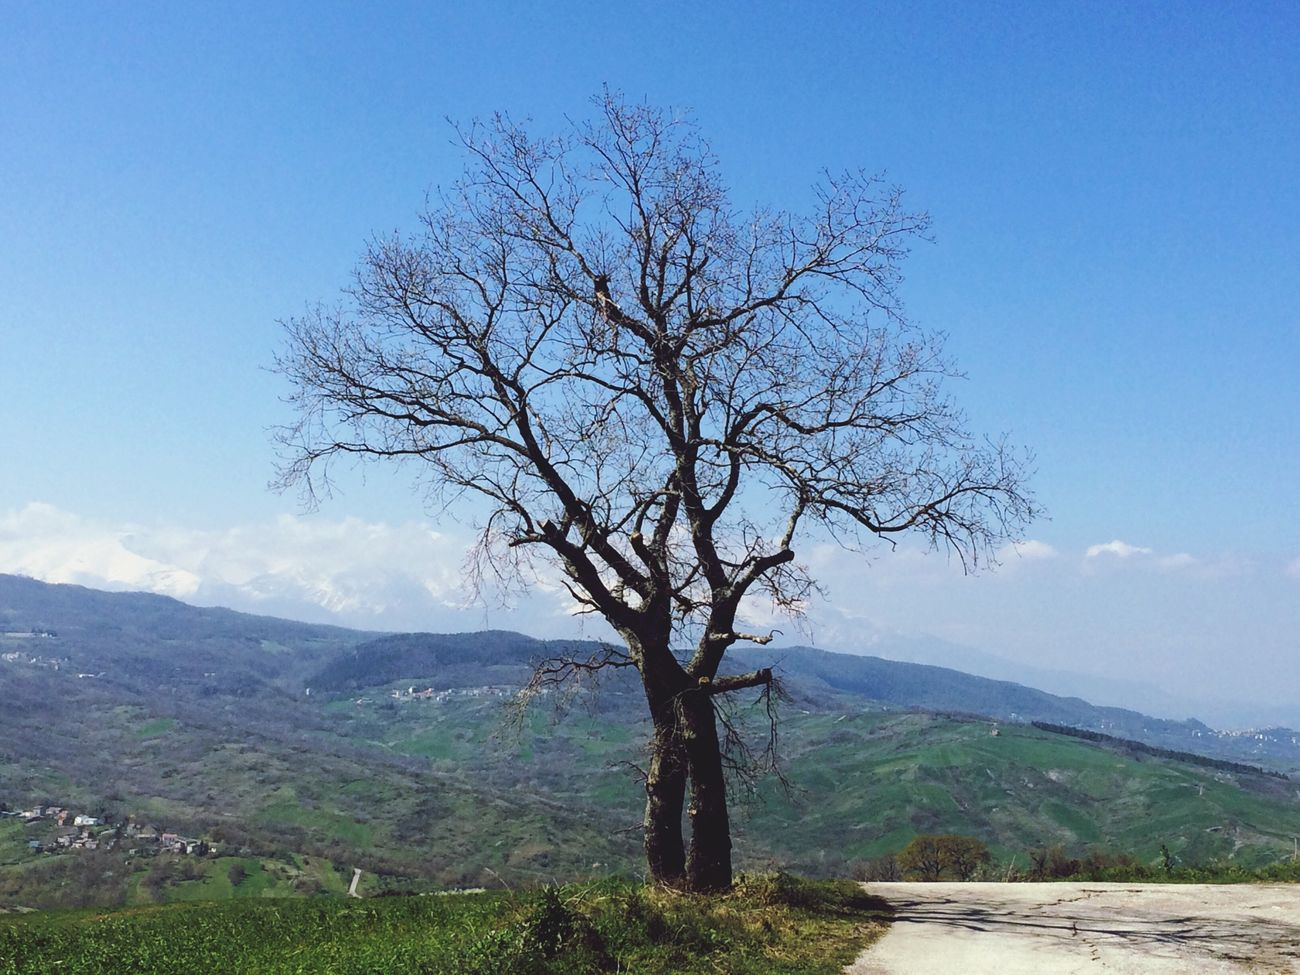 Nature Paesaggio Tree Special Photography Very Beautiful Spetacular Photographer Photo Art Beautiful Spectacle Meraviglia Fabolous